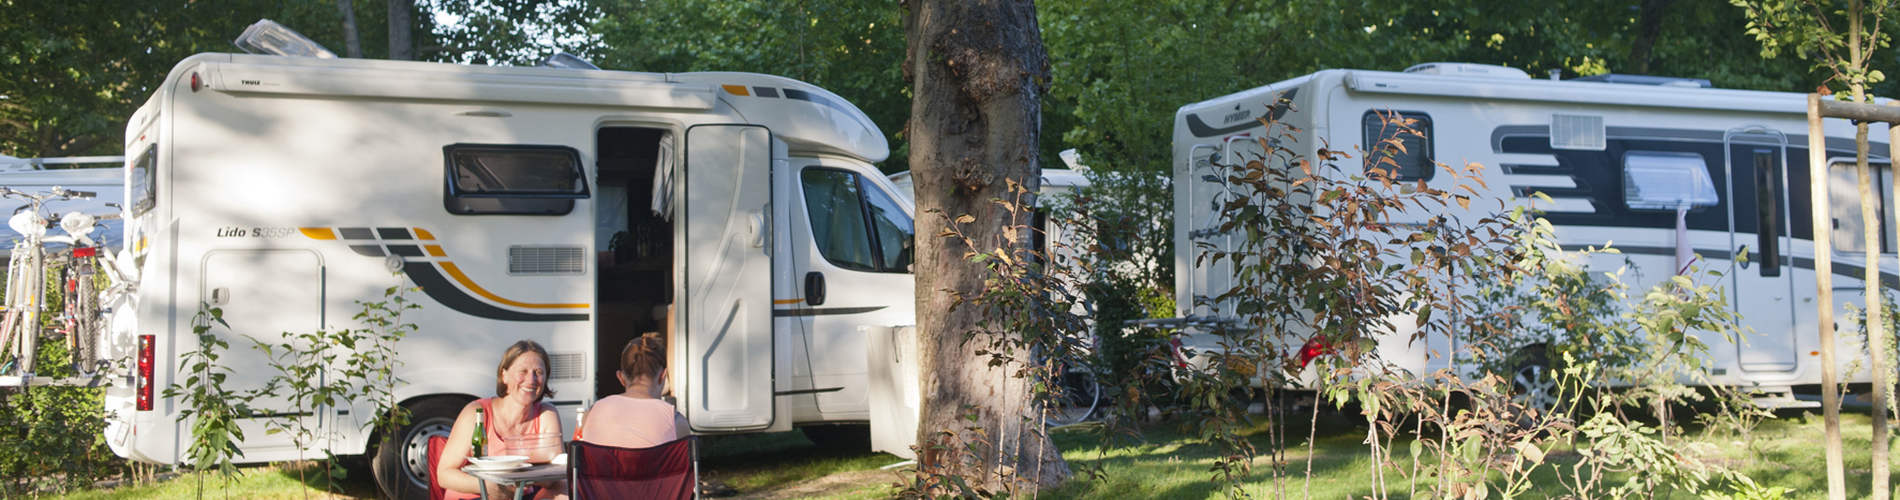 camping_paris_emplacements_camping_campingcar.